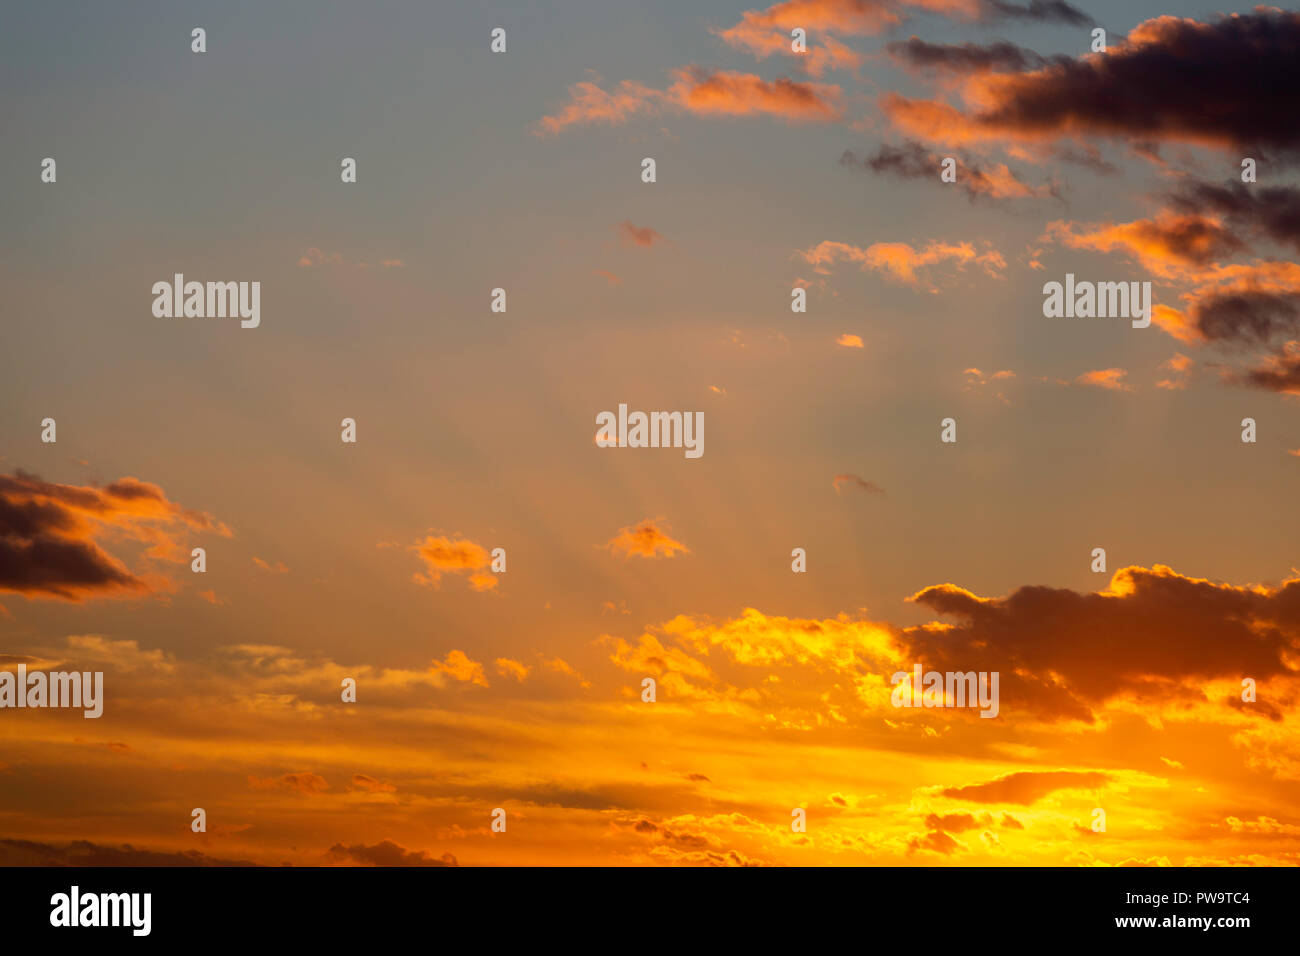 God Rays Stock Photos Amp God Rays Stock Images Alamy